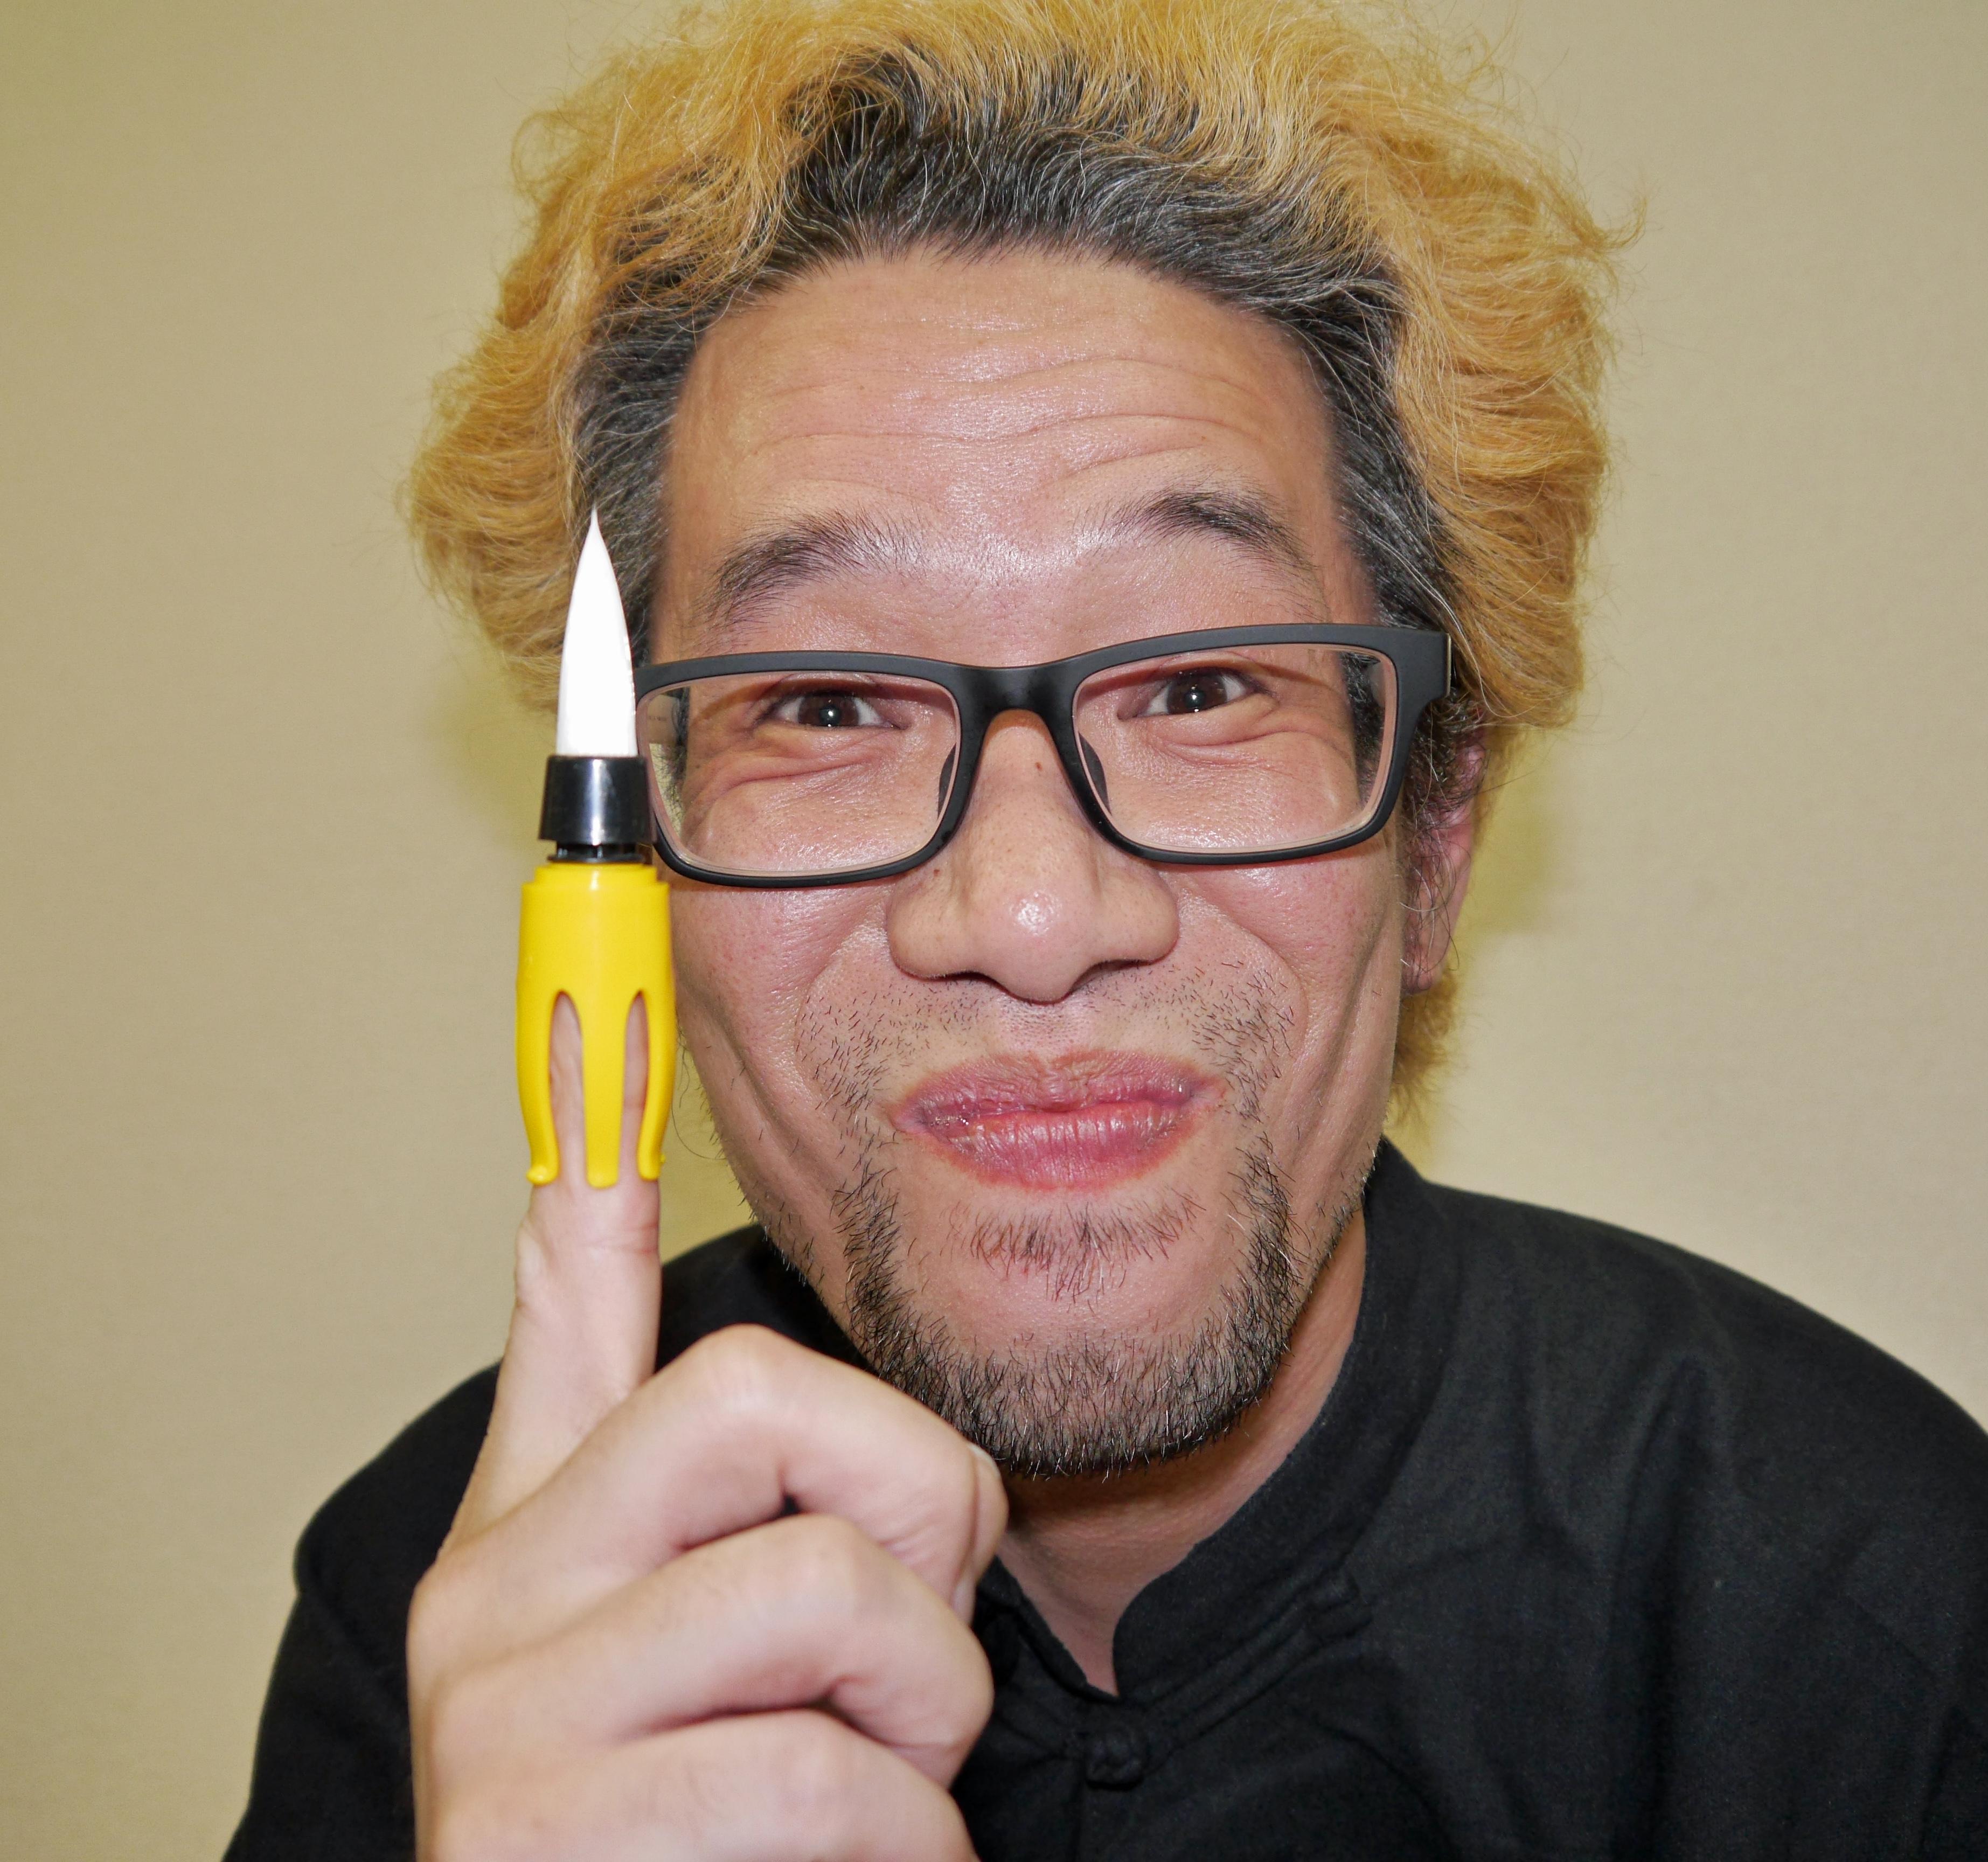 fudeyubi1